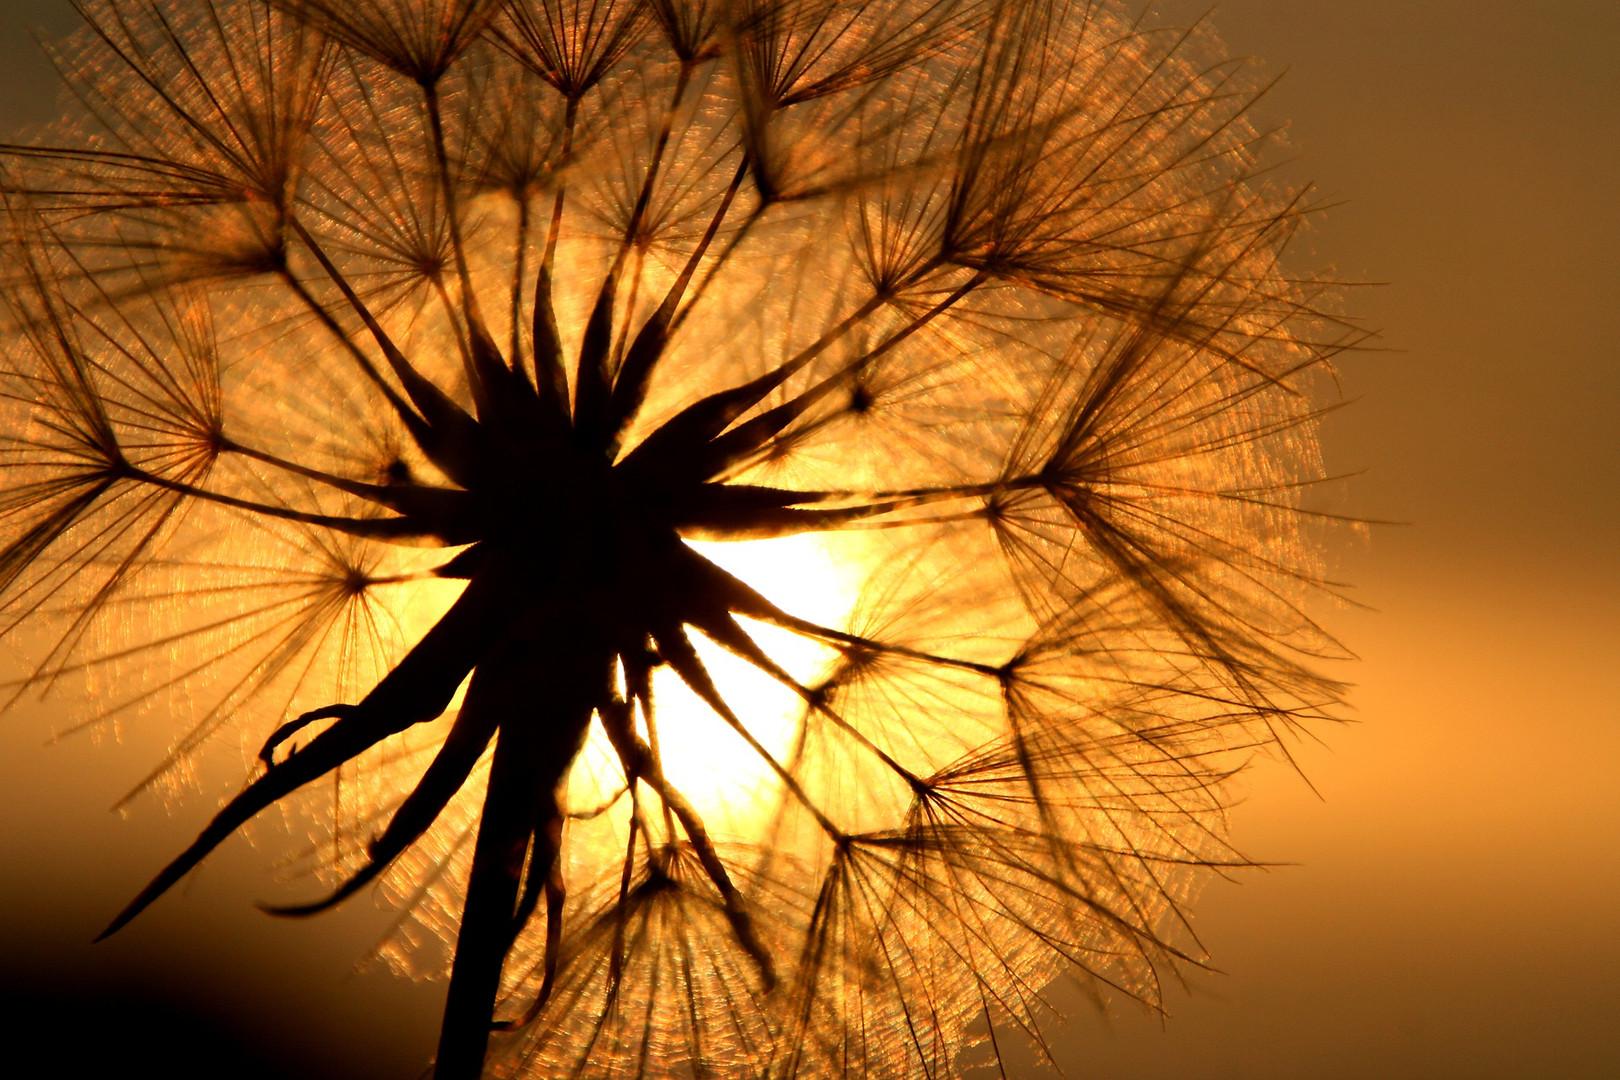 dandelion-1684903_1920.jpg